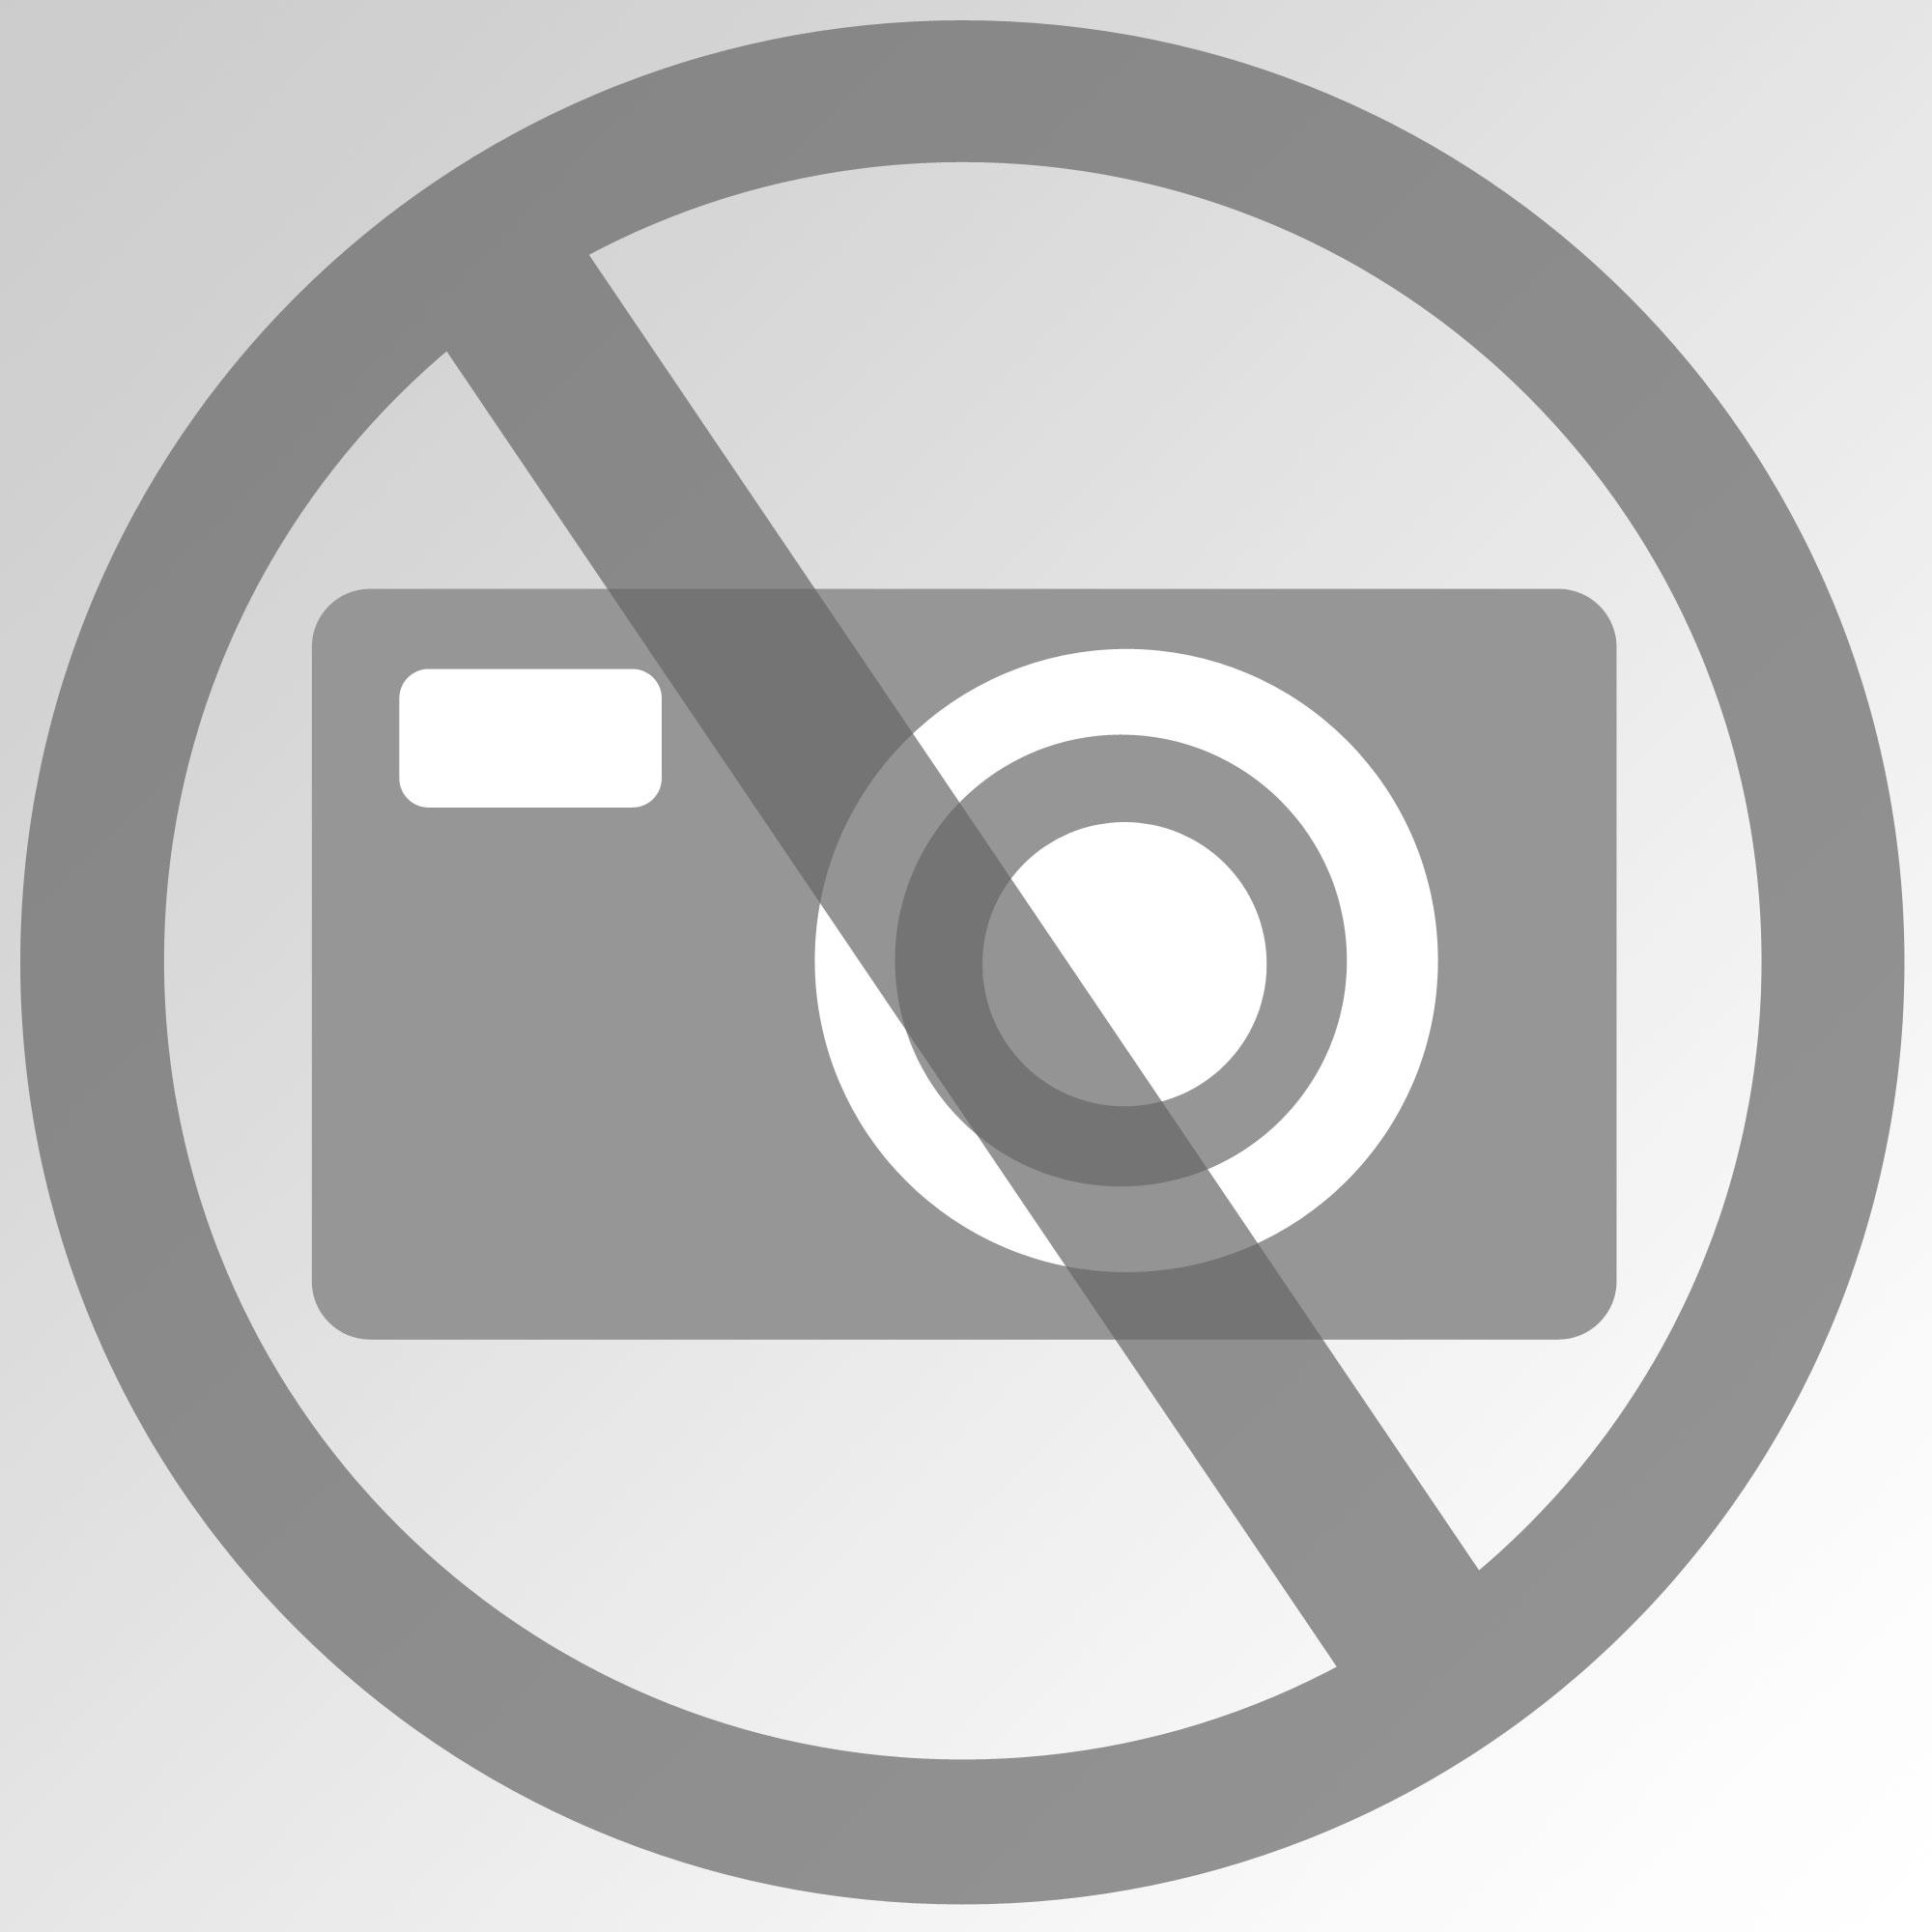 Tana Apesin KDR food 10 l Küchen-Desinfektionsreiniger